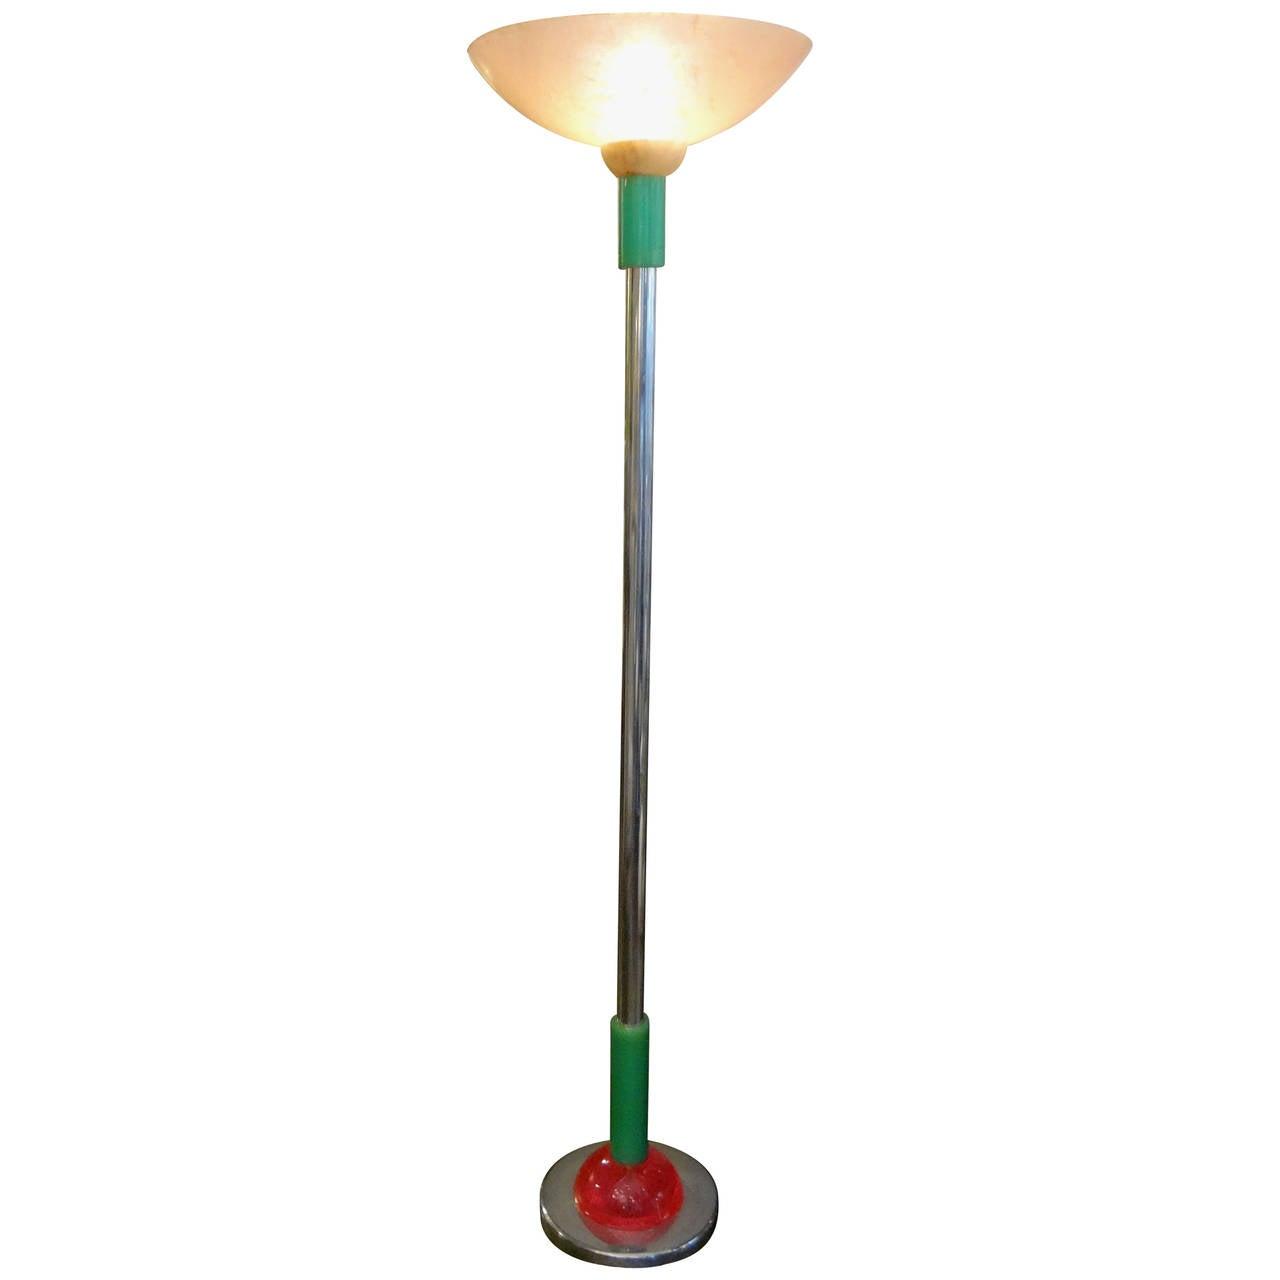 Italian Post-Modern/Mid-Century Modern Floor Lamp, Made in Milan